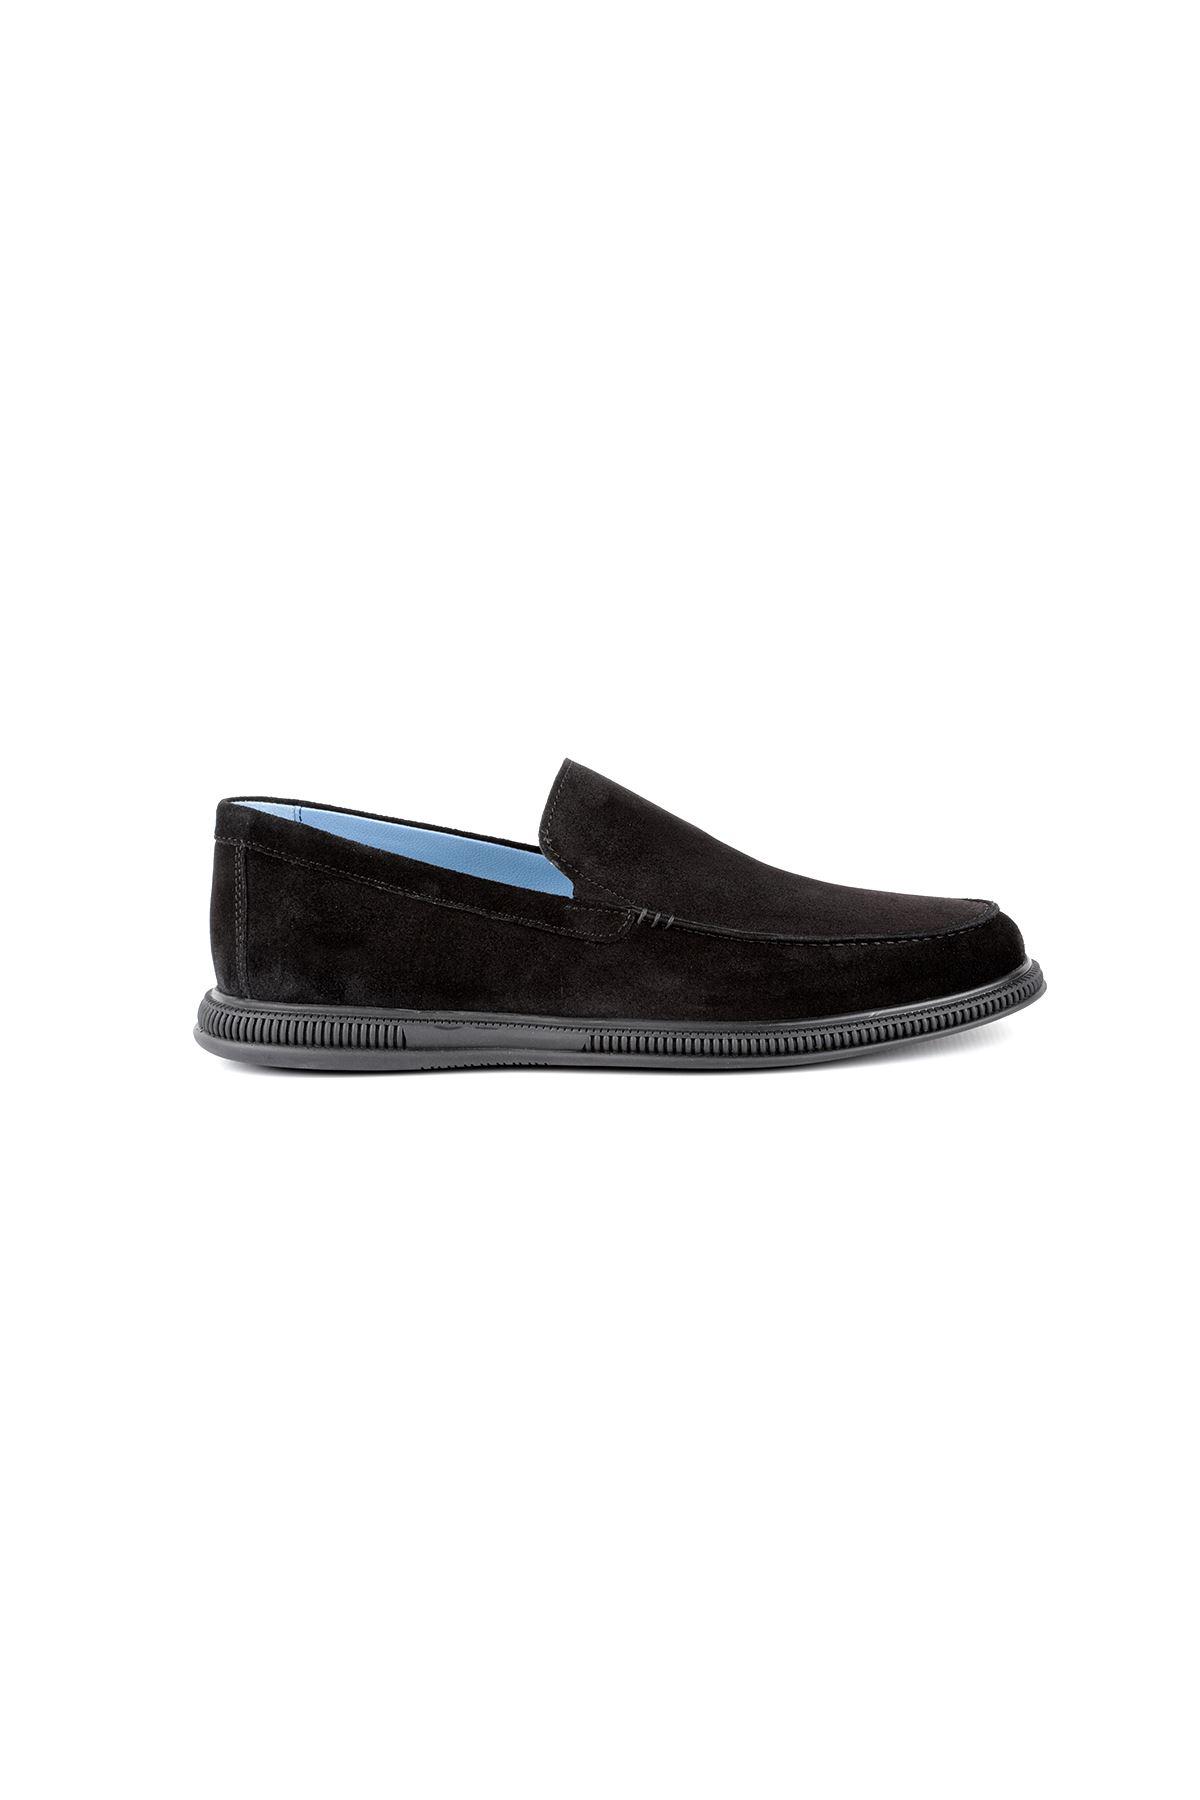 Libero L3635 Black Loafer Men's Shoes